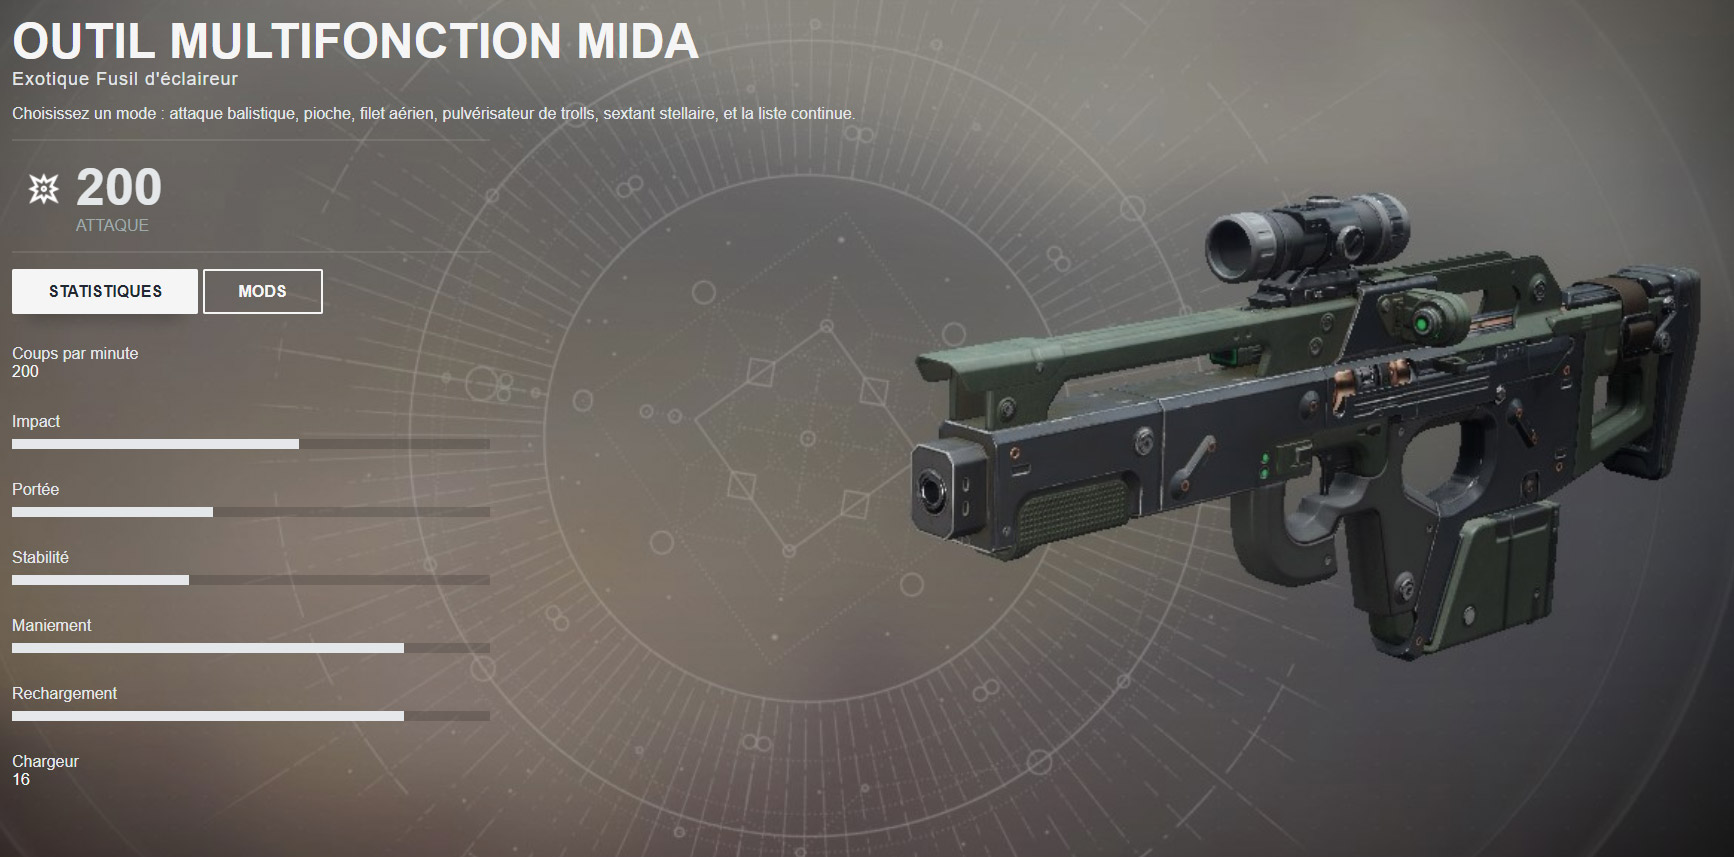 Outil multifonction MIDA